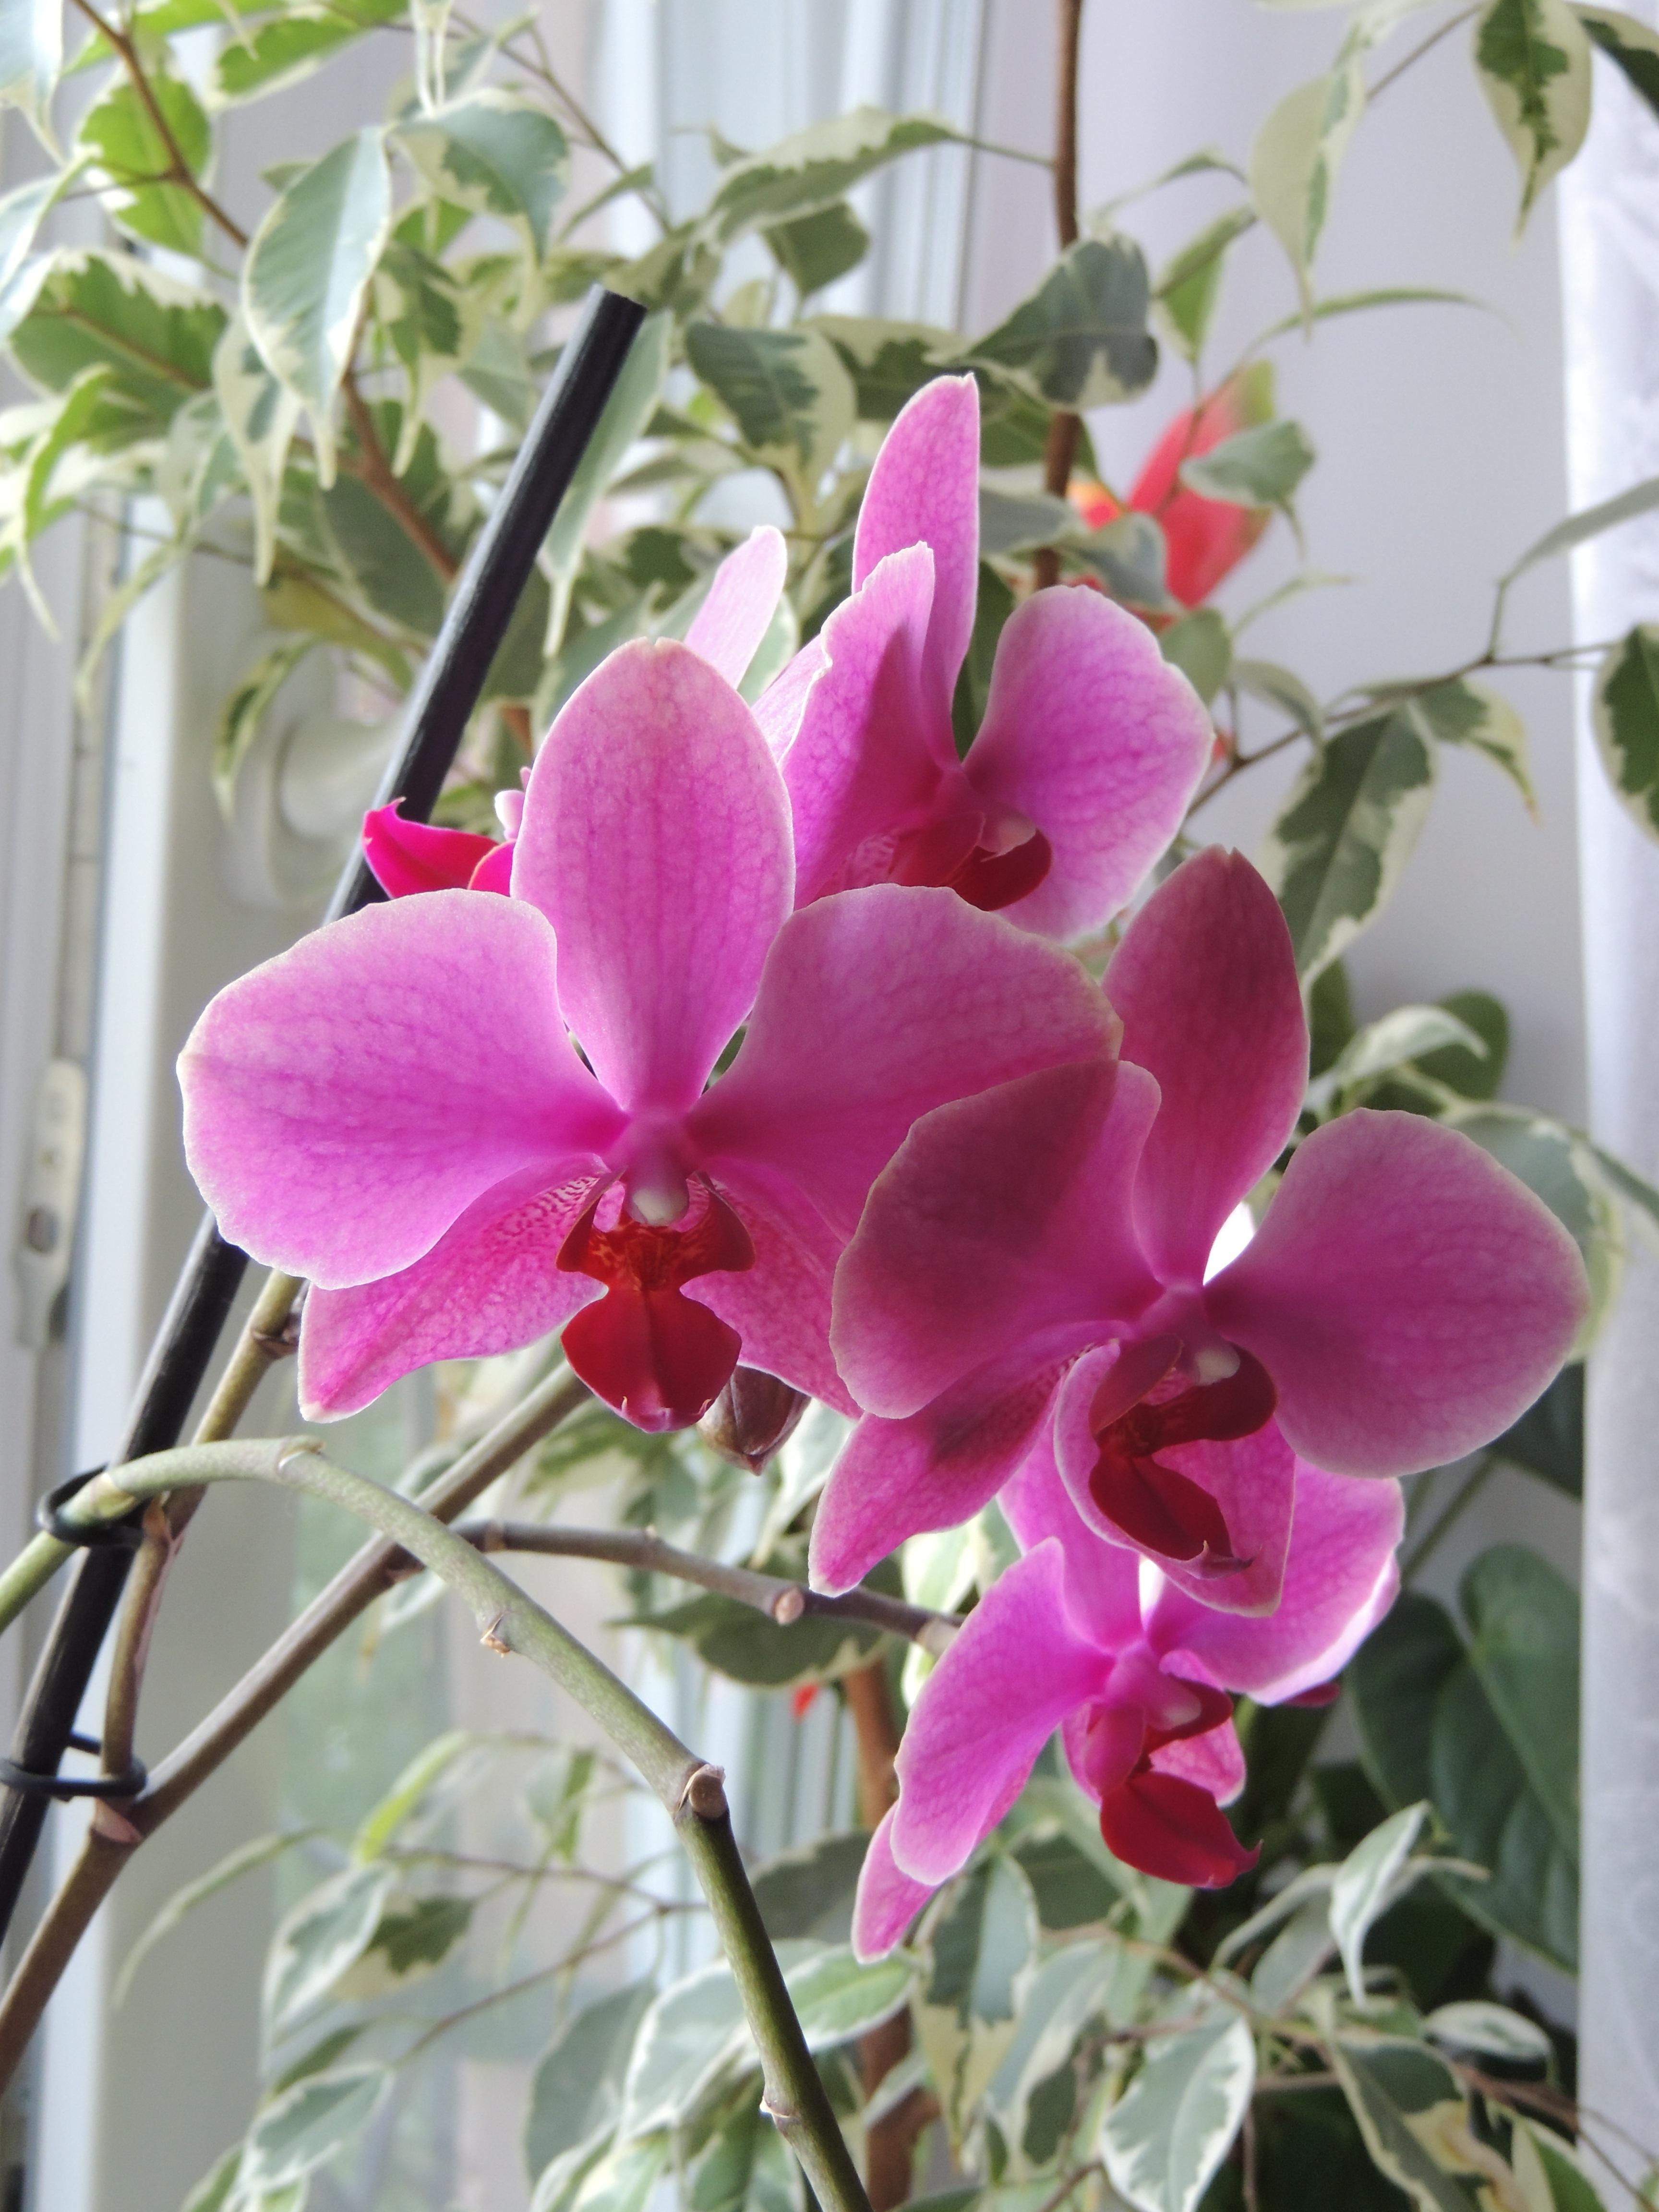 Free images blossom bloom botany flora plants flowers beauty blossom plant flower bloom botany flora plants orchid flowers beauty krupnyj plan beautiful flower flowering plant izmirmasajfo